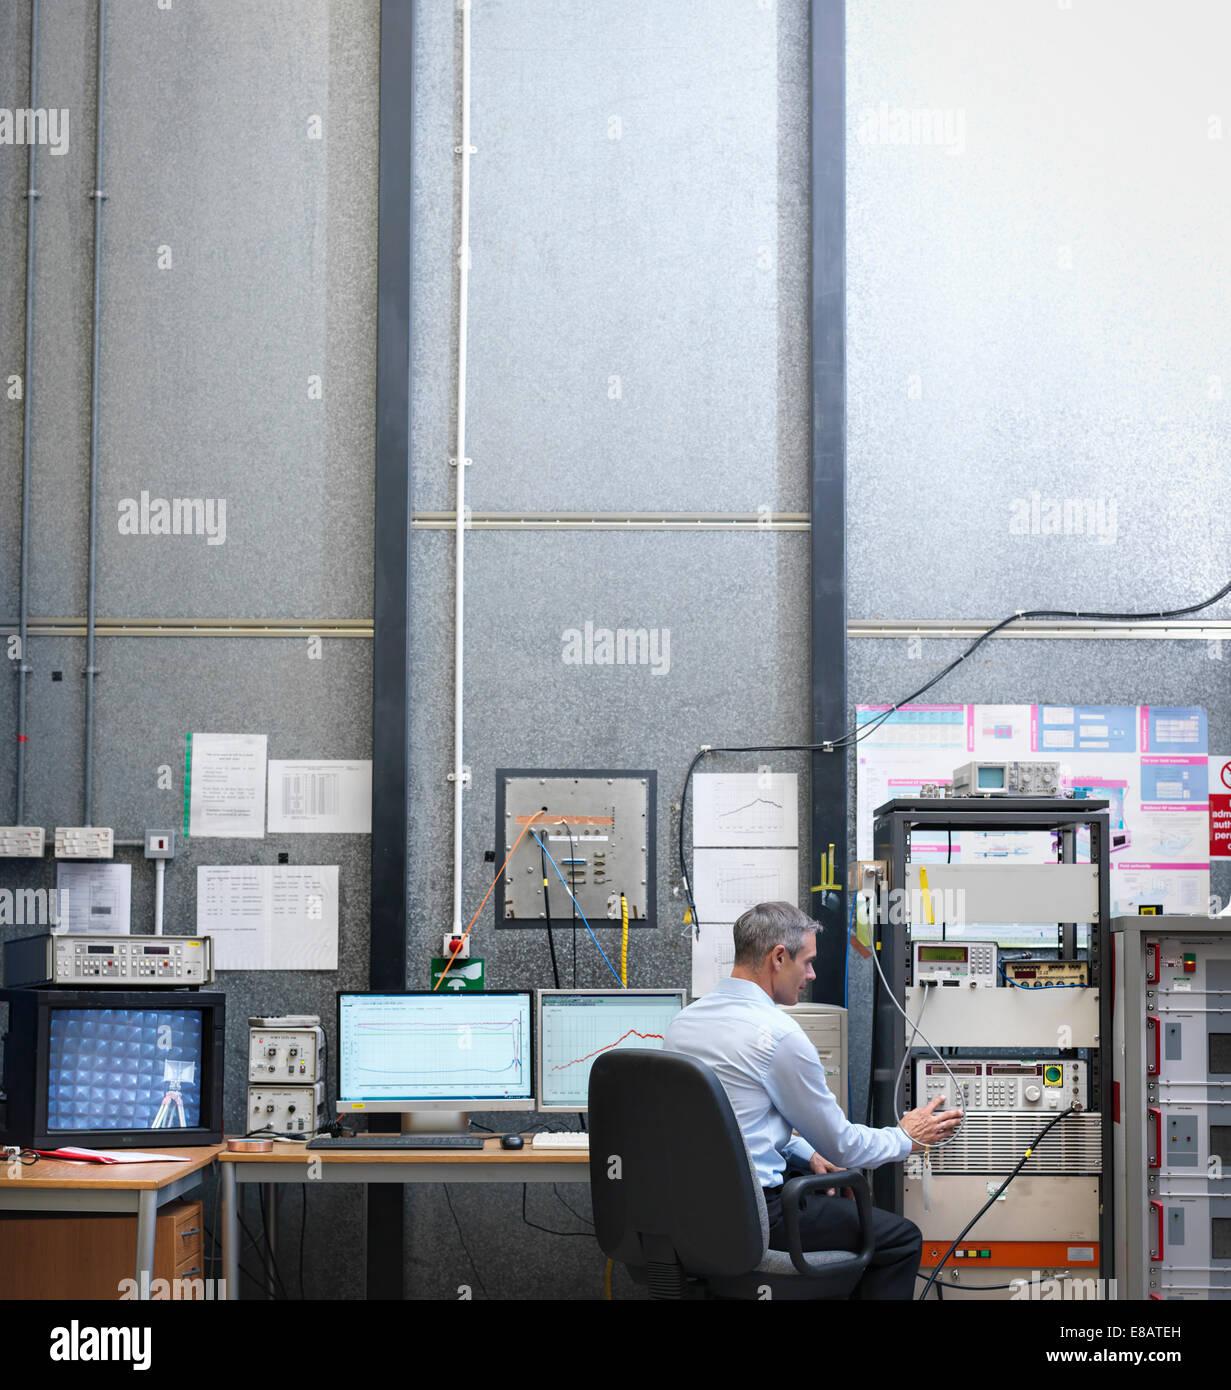 Estación de trabajo científico en cámara anecoica Imagen De Stock